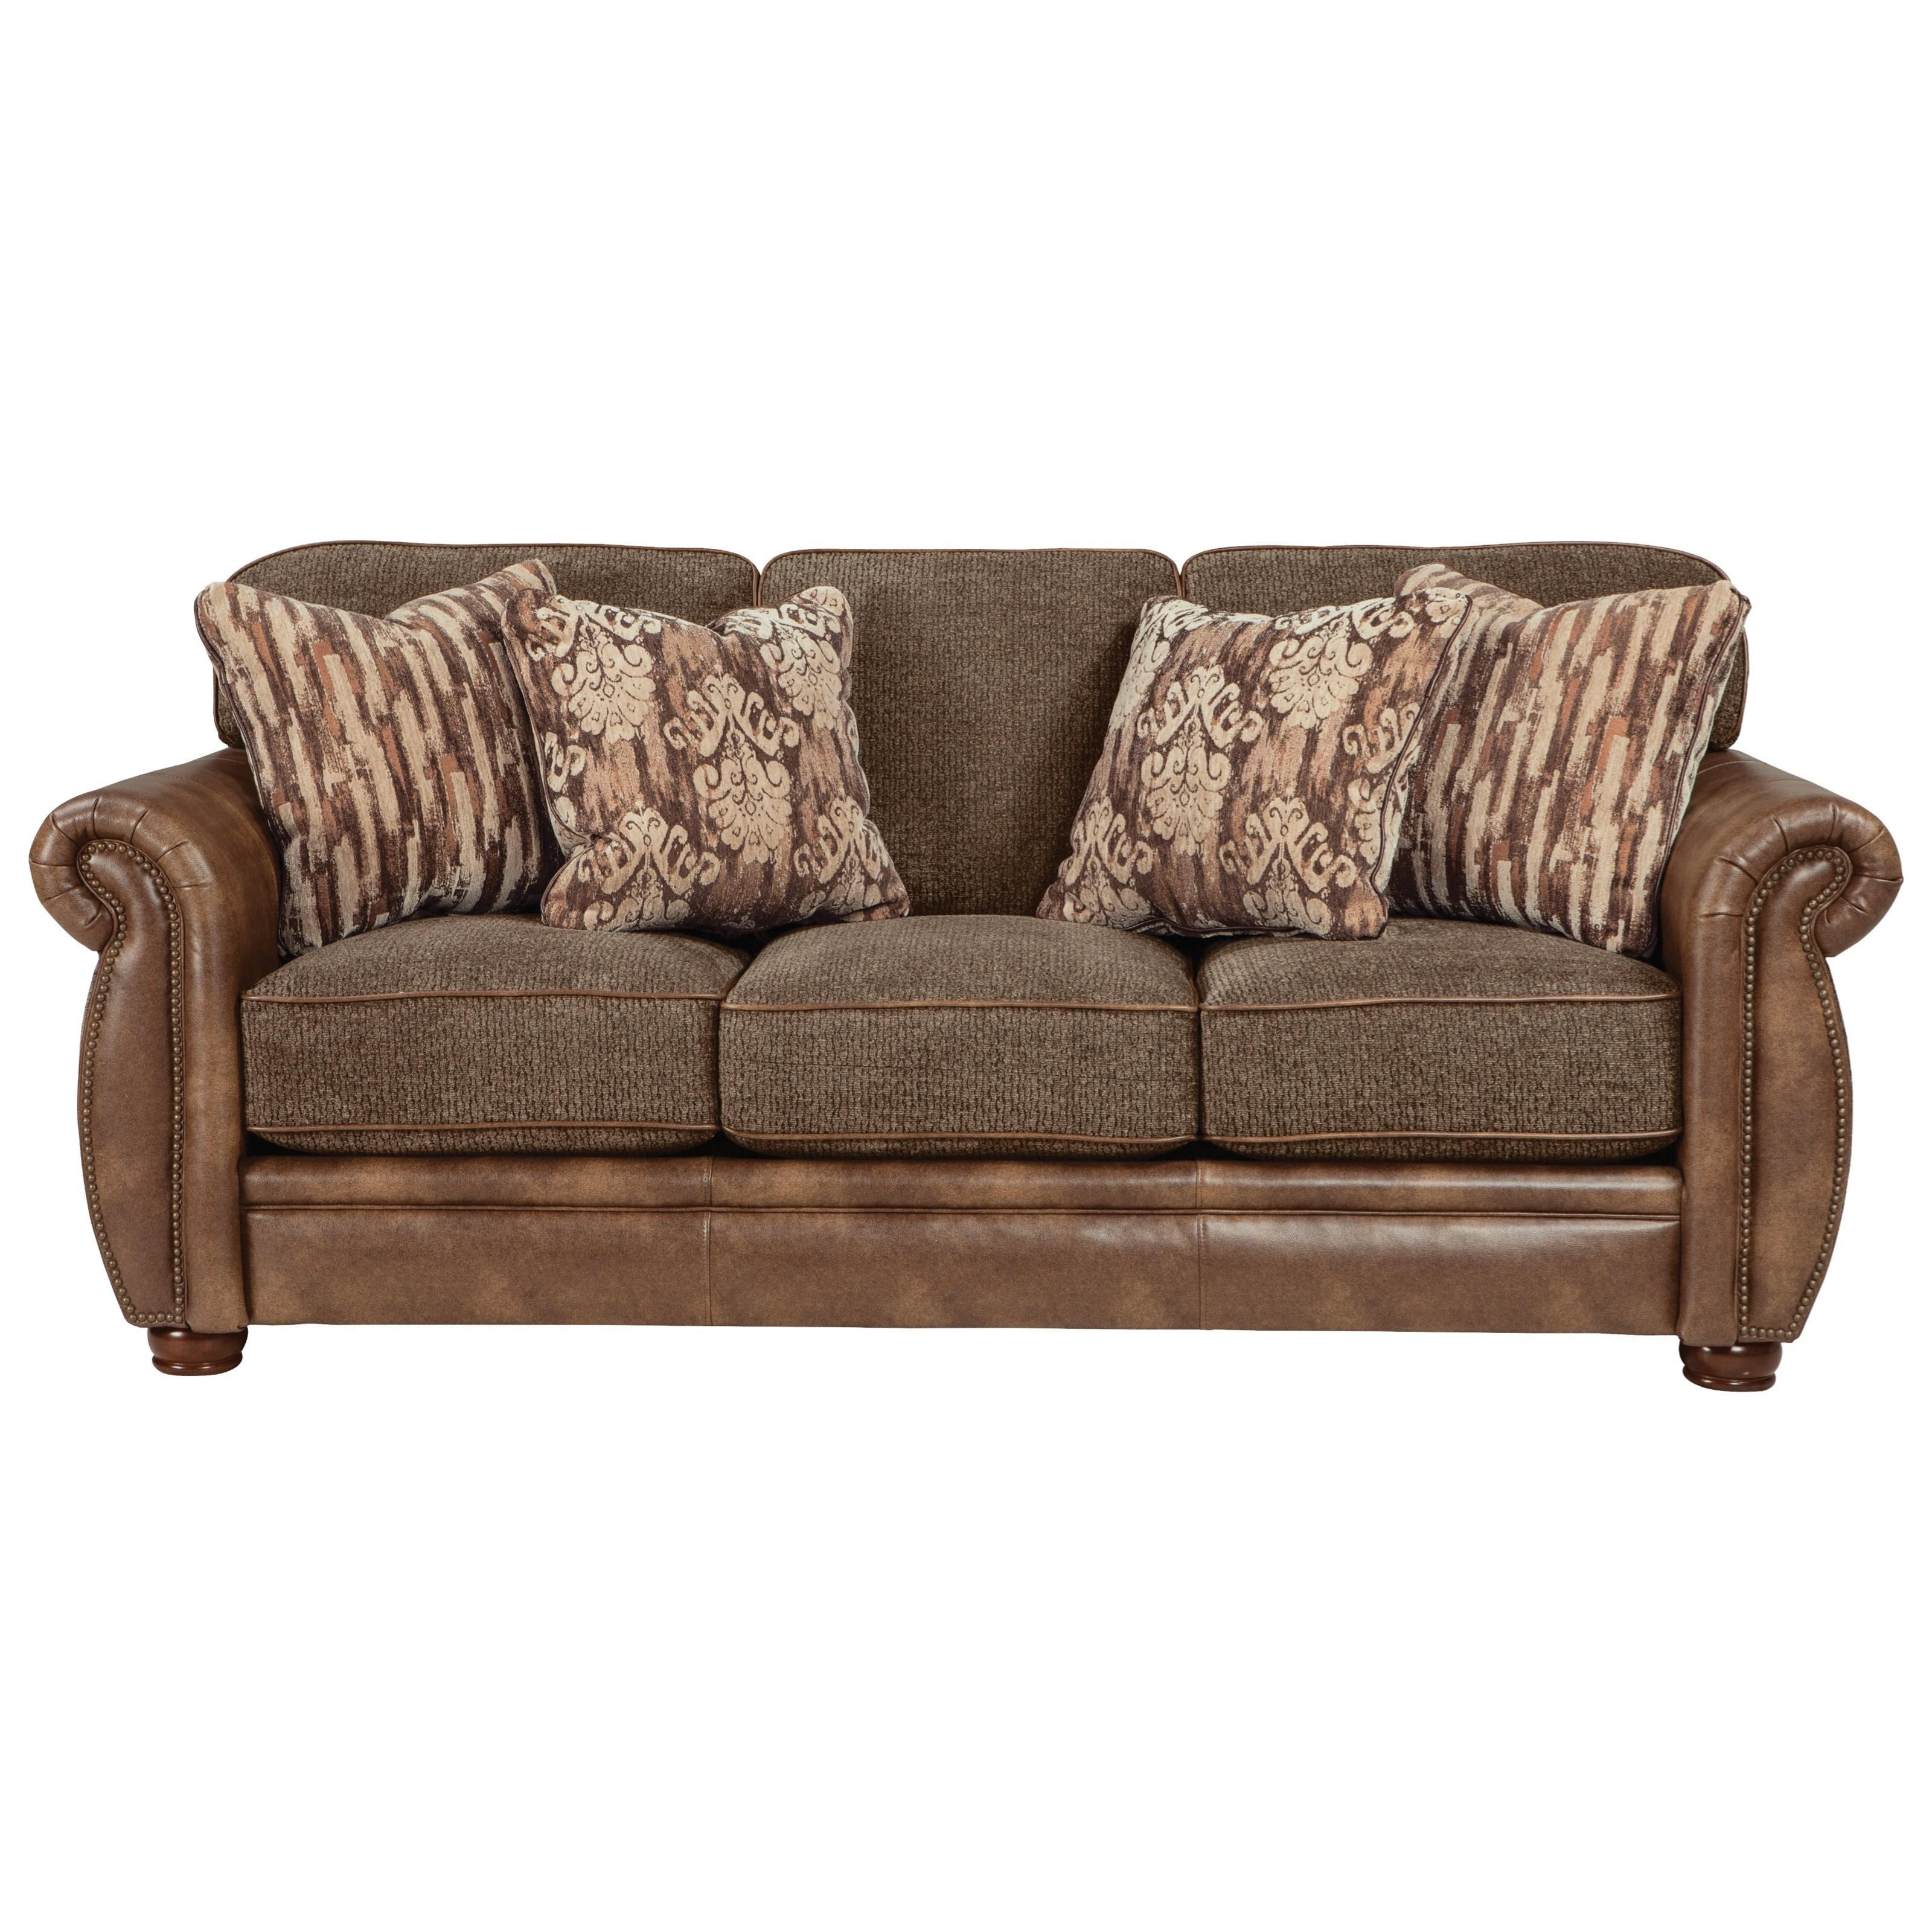 Jackson Furniture Pennington Traditional Styled Queen Sleeper Sofa   Adcock  Furniture   Sleeper Sofas